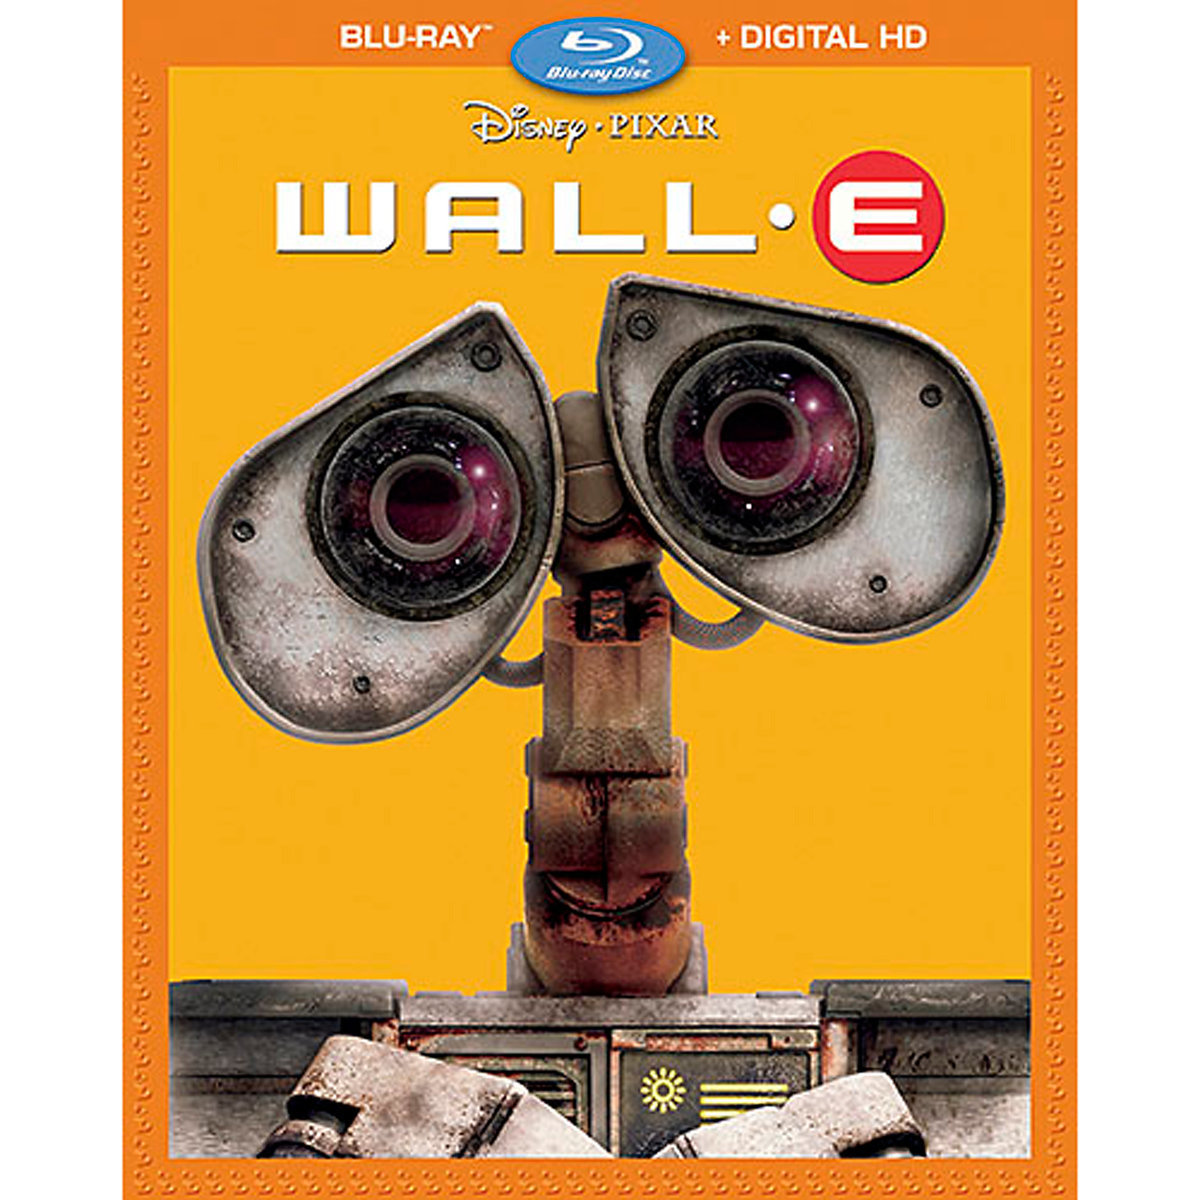 WALL•E (Blu-ray + Digital HD)